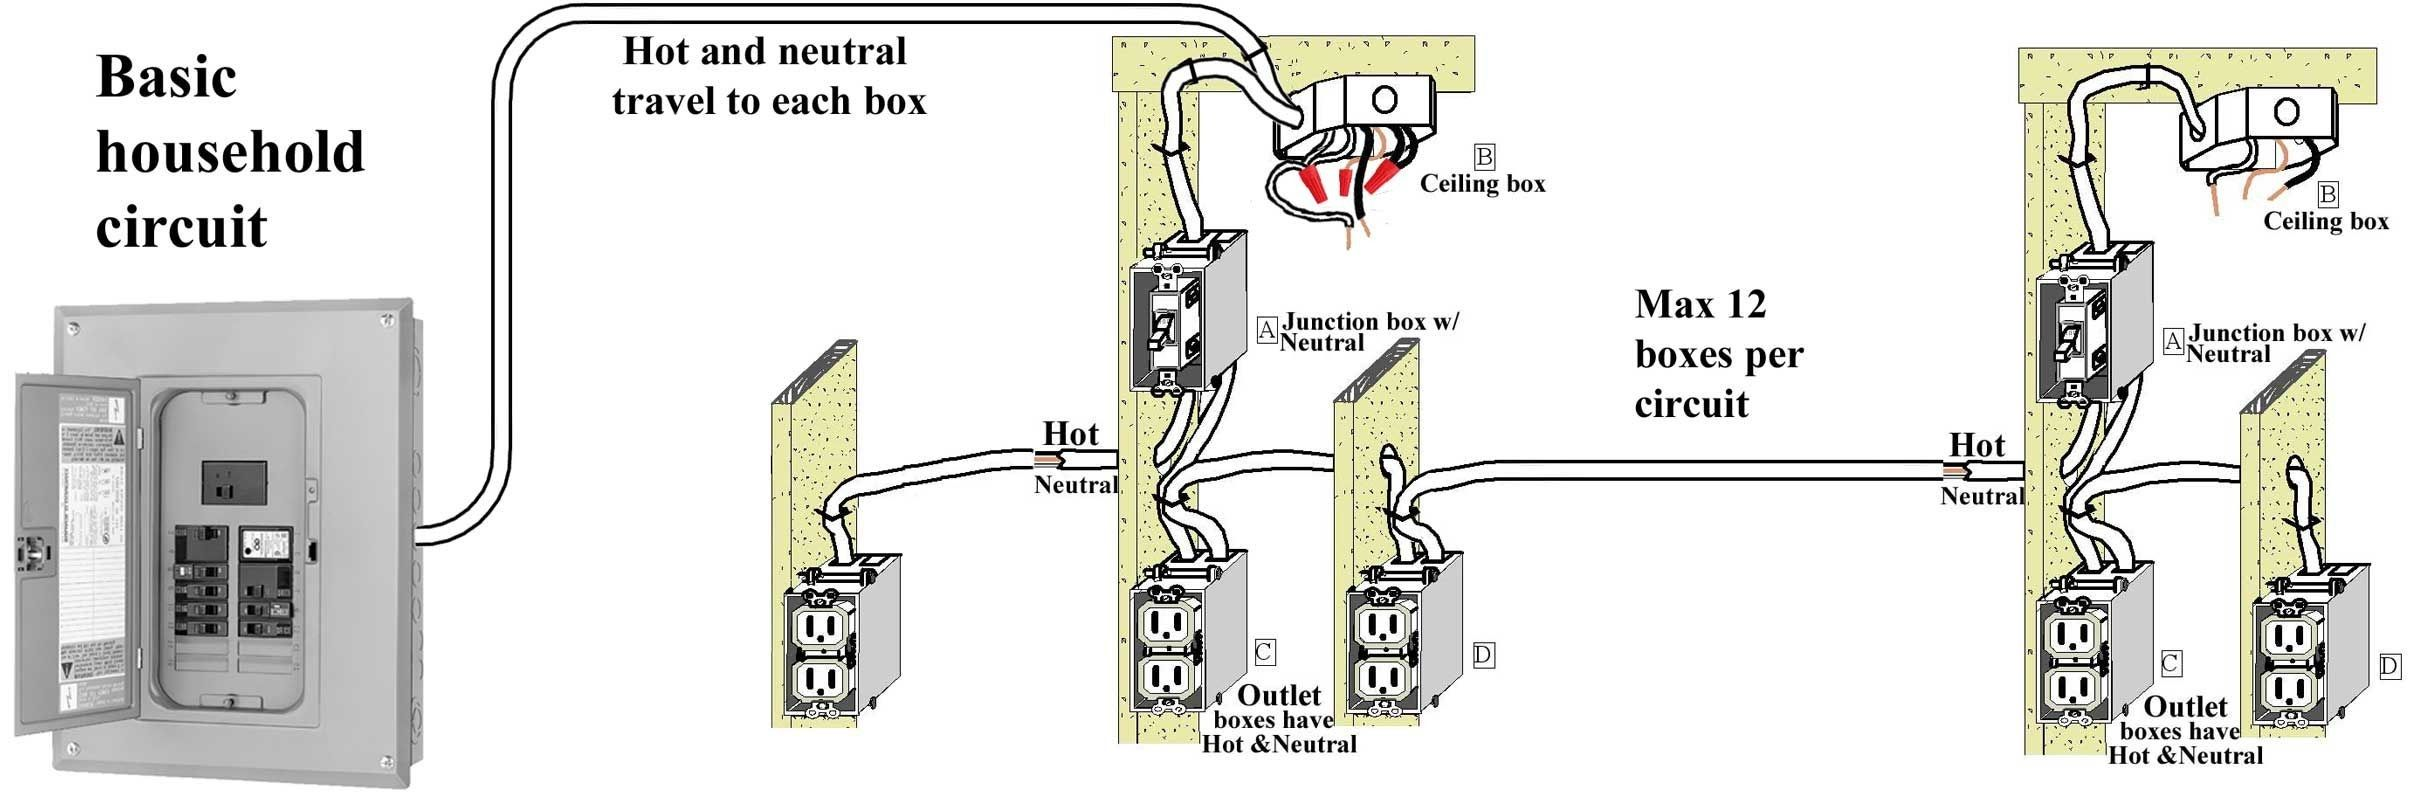 new basic electrical wiring diagram diagram wiringdiagram diagramming diagramm visuals  [ 2431 x 800 Pixel ]